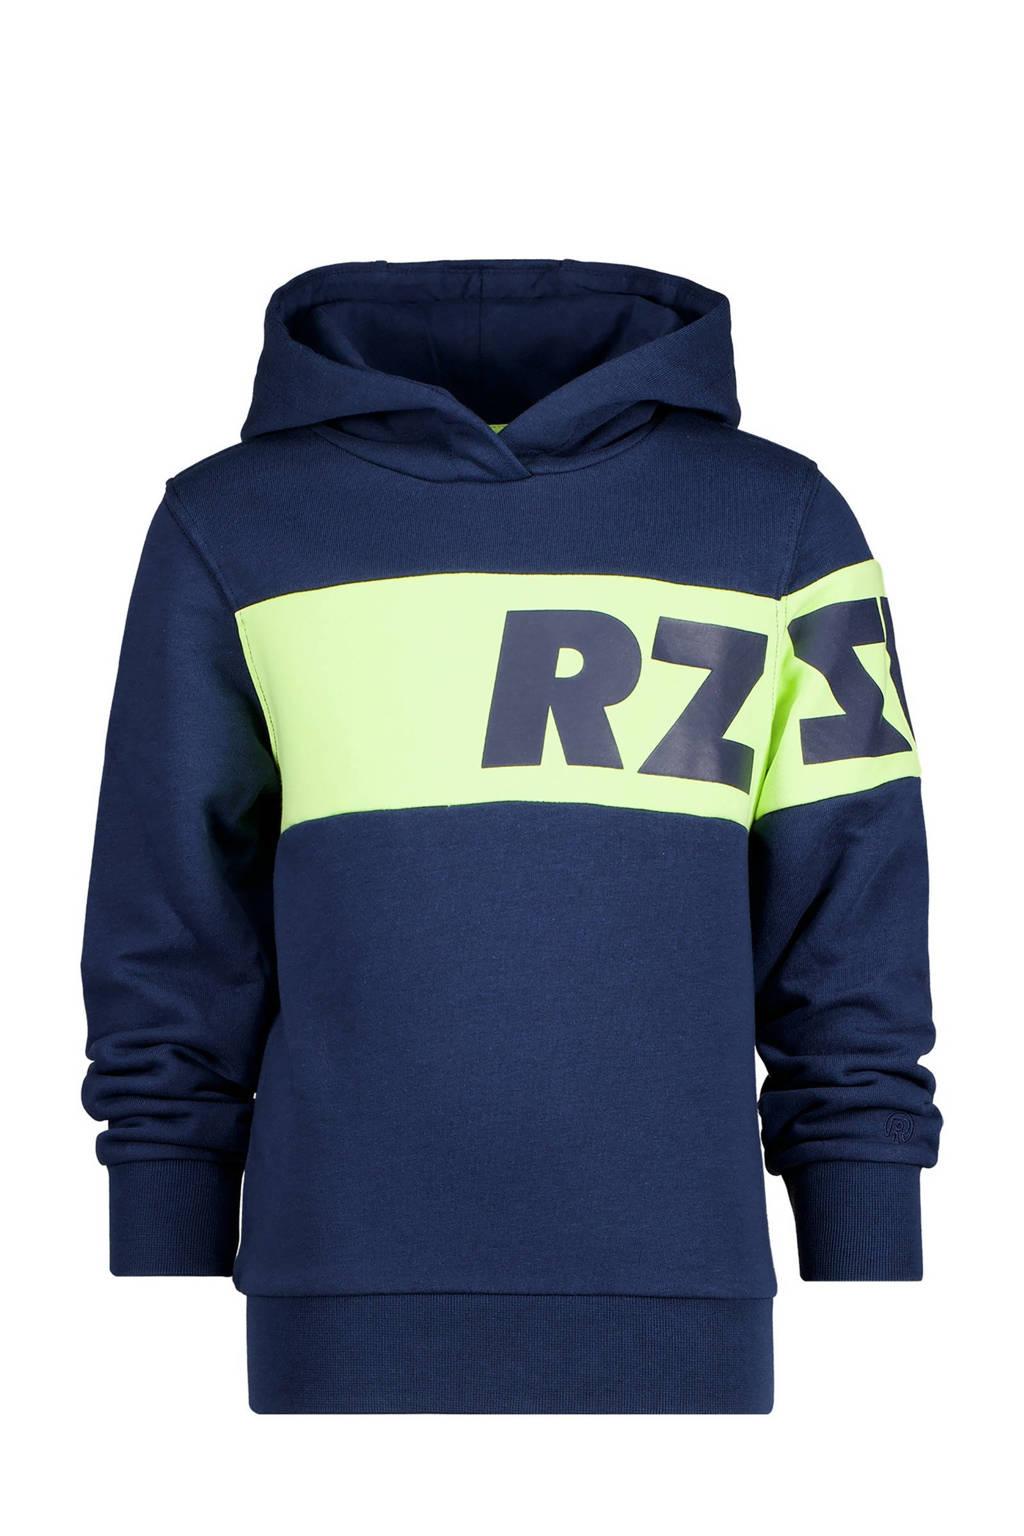 Raizzed hoodie Jeff met logo donkerblauw, Donkerblauw